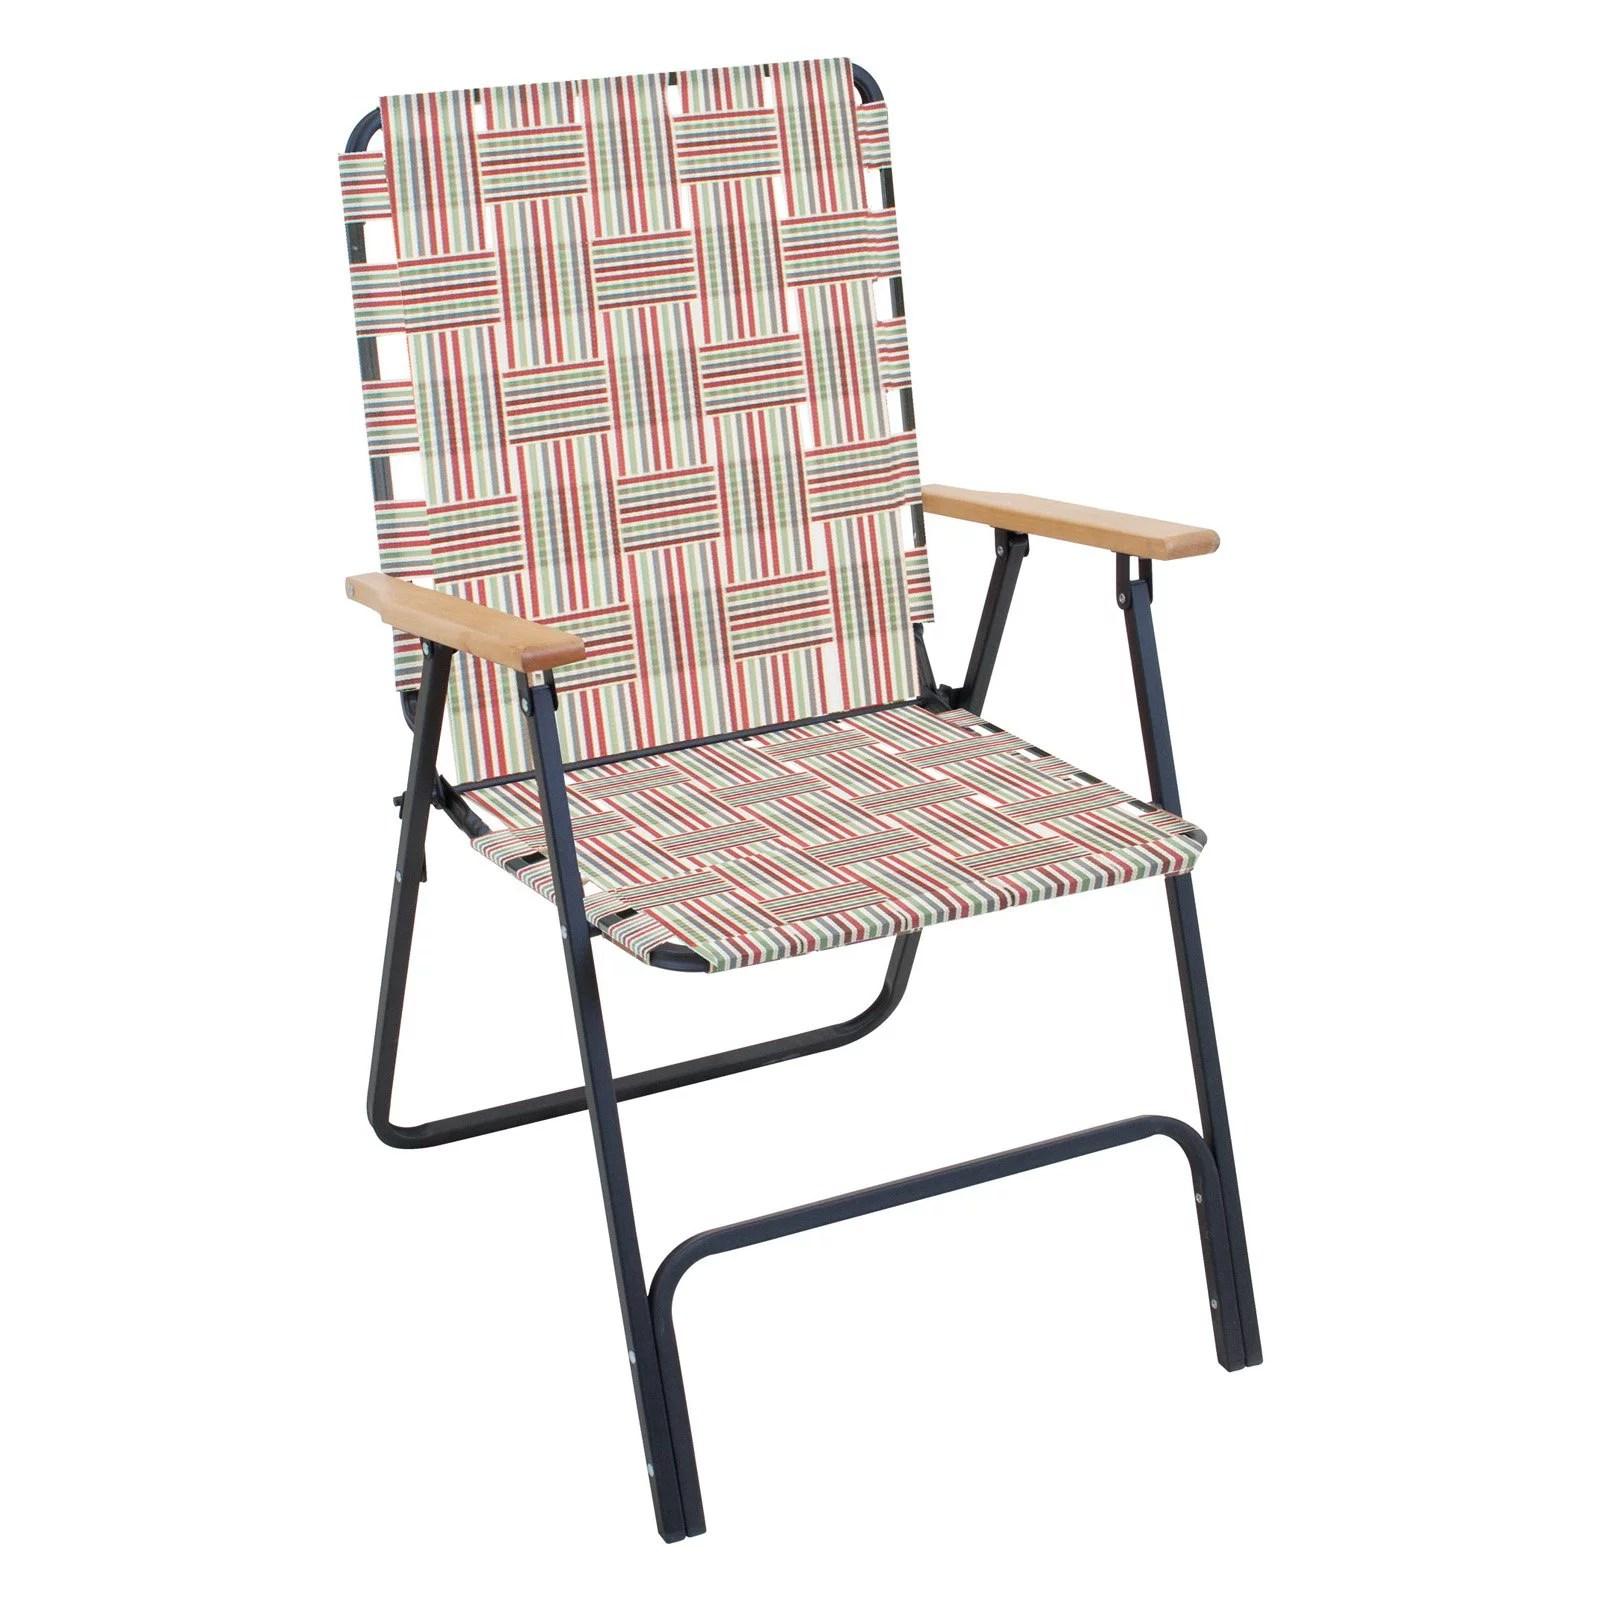 walmart lawn chair office wont stay up rio brands folding highback web com